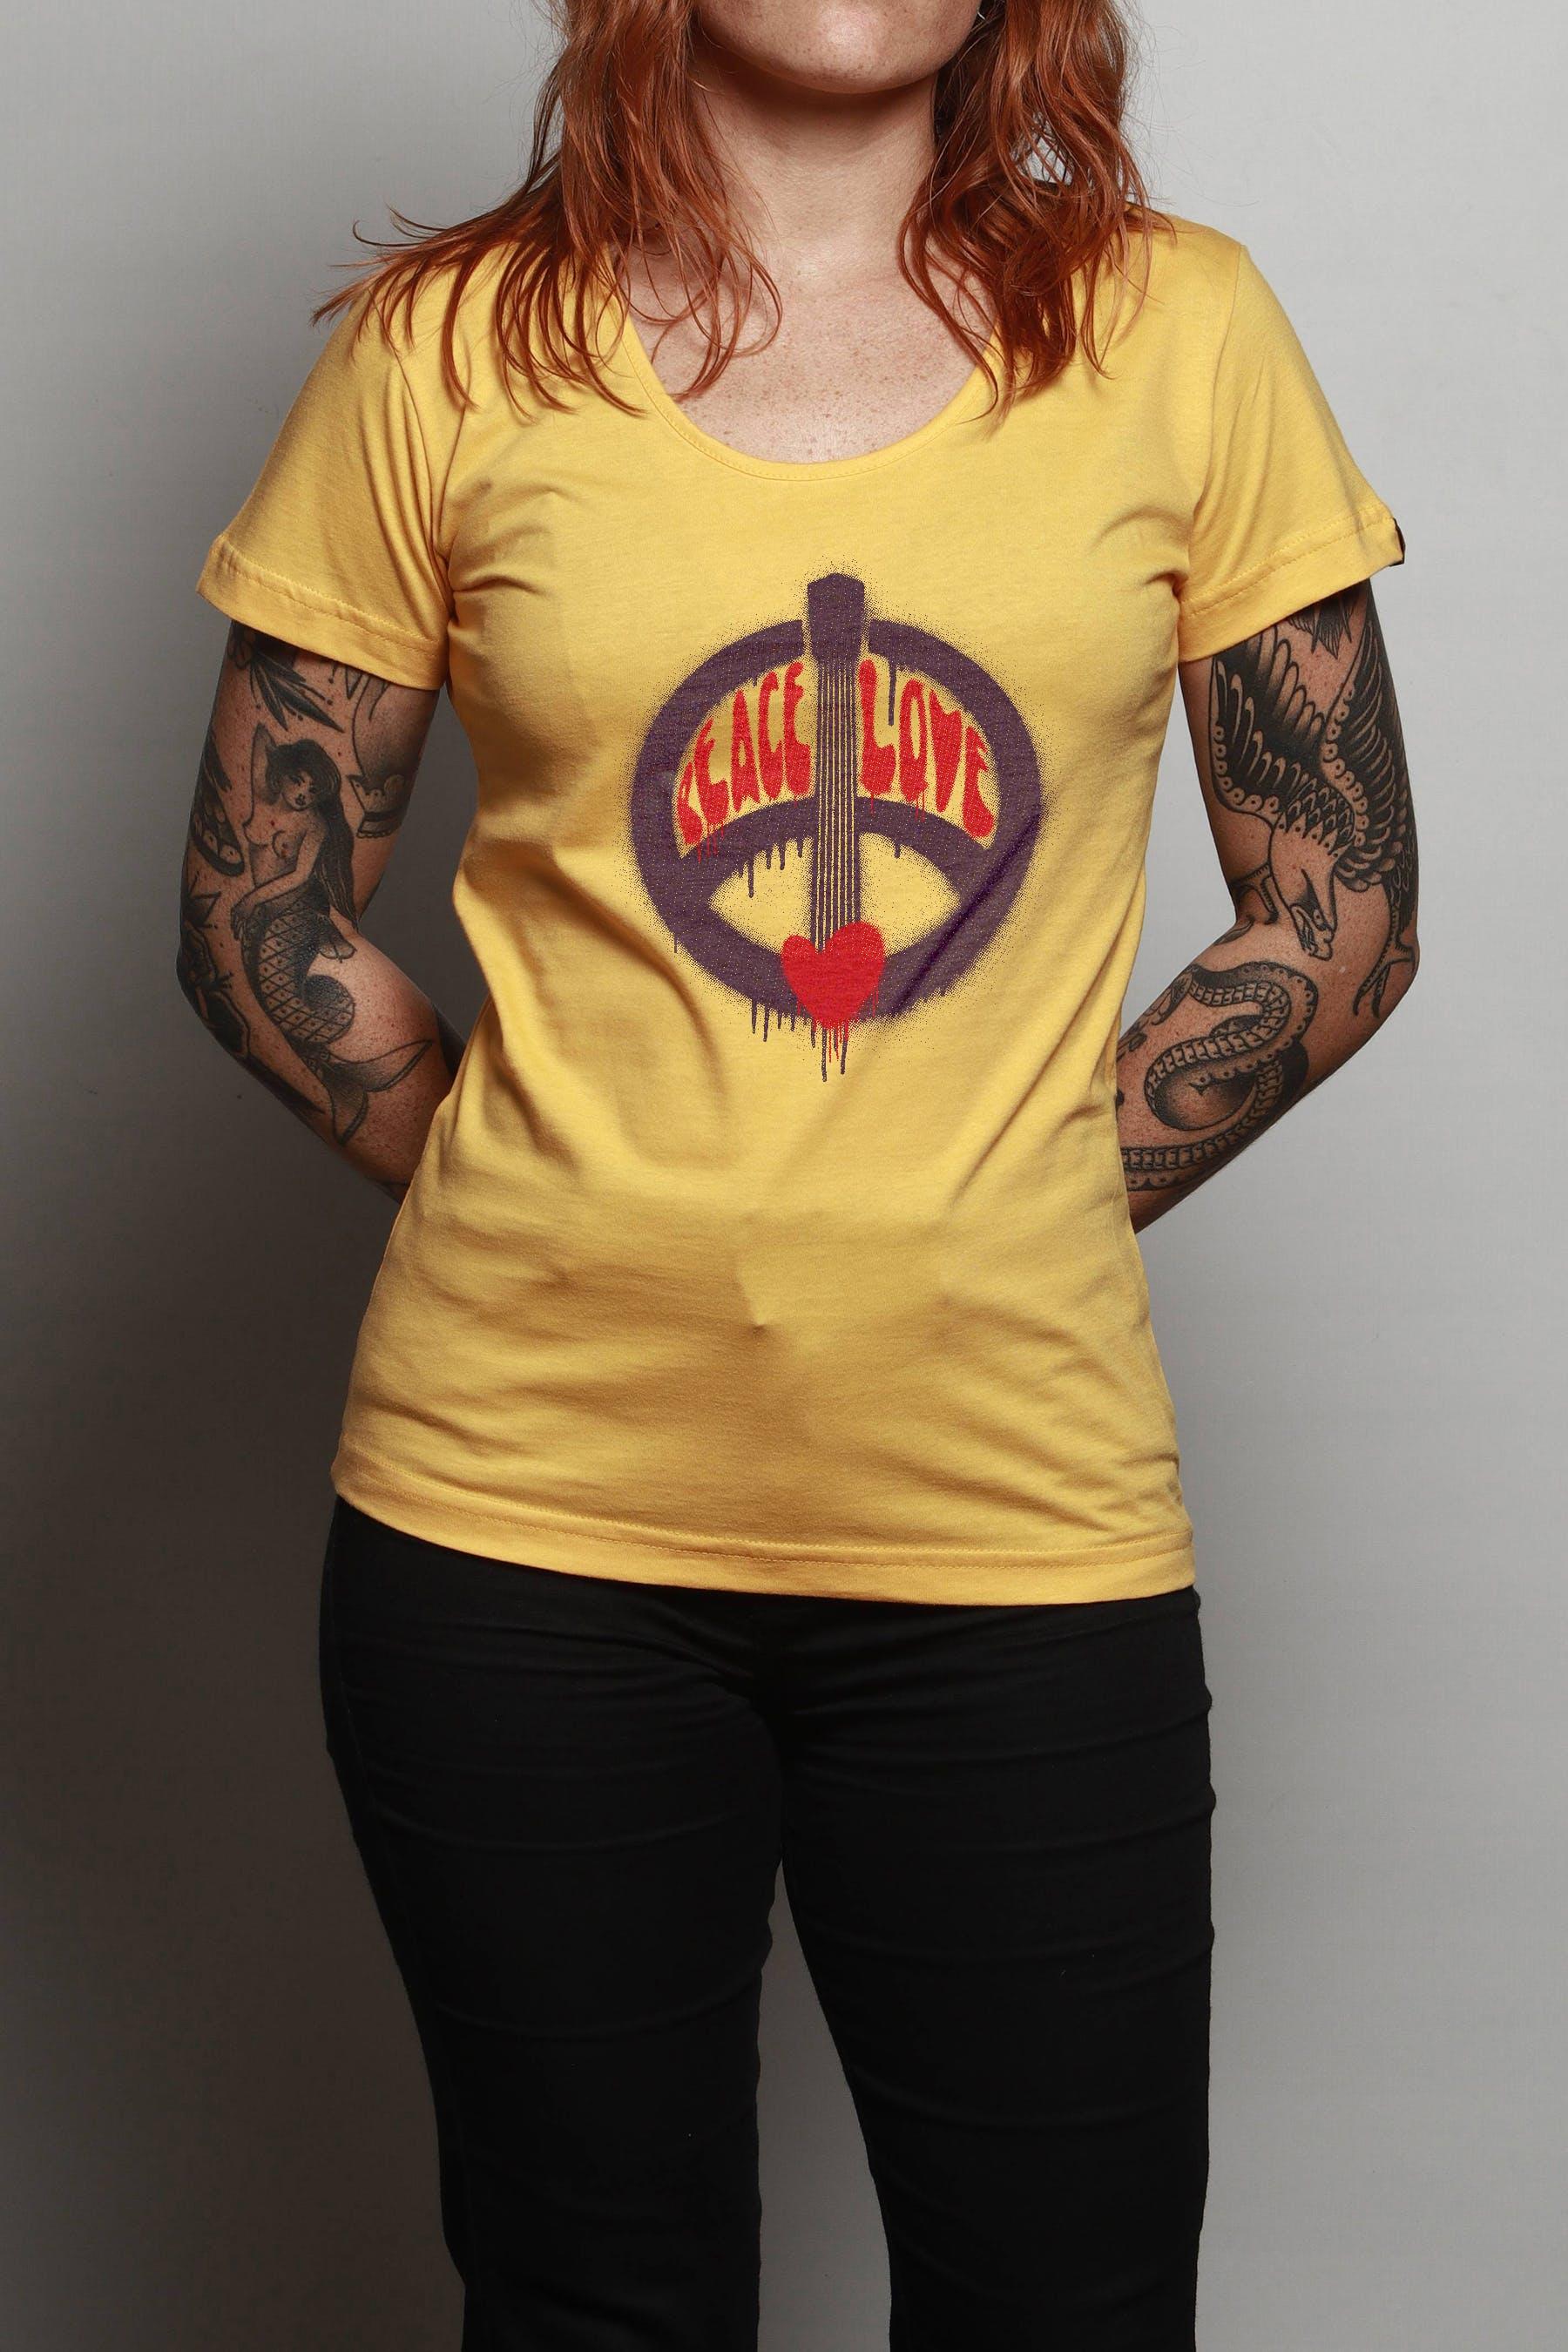 Camiseta Peace, Love And Música